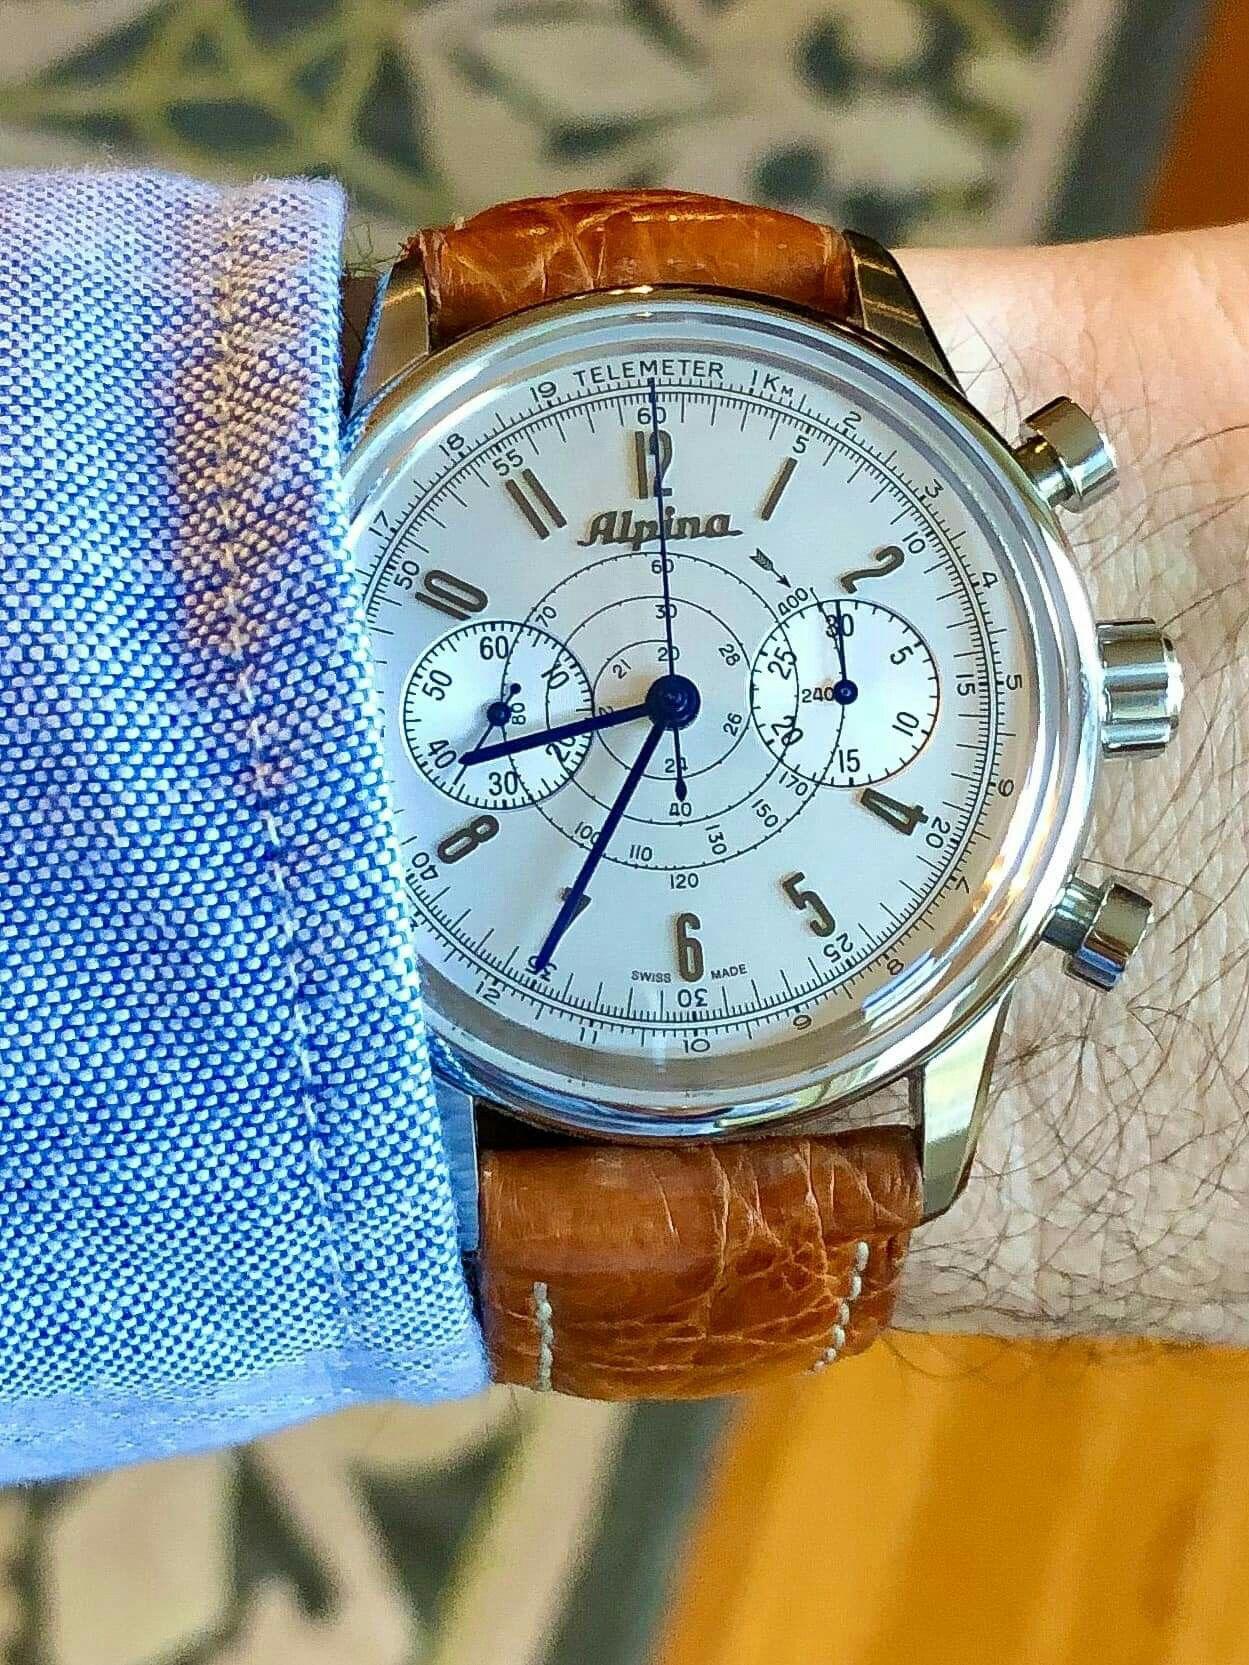 Pin de Marcos Vázquez en watches | Reloj